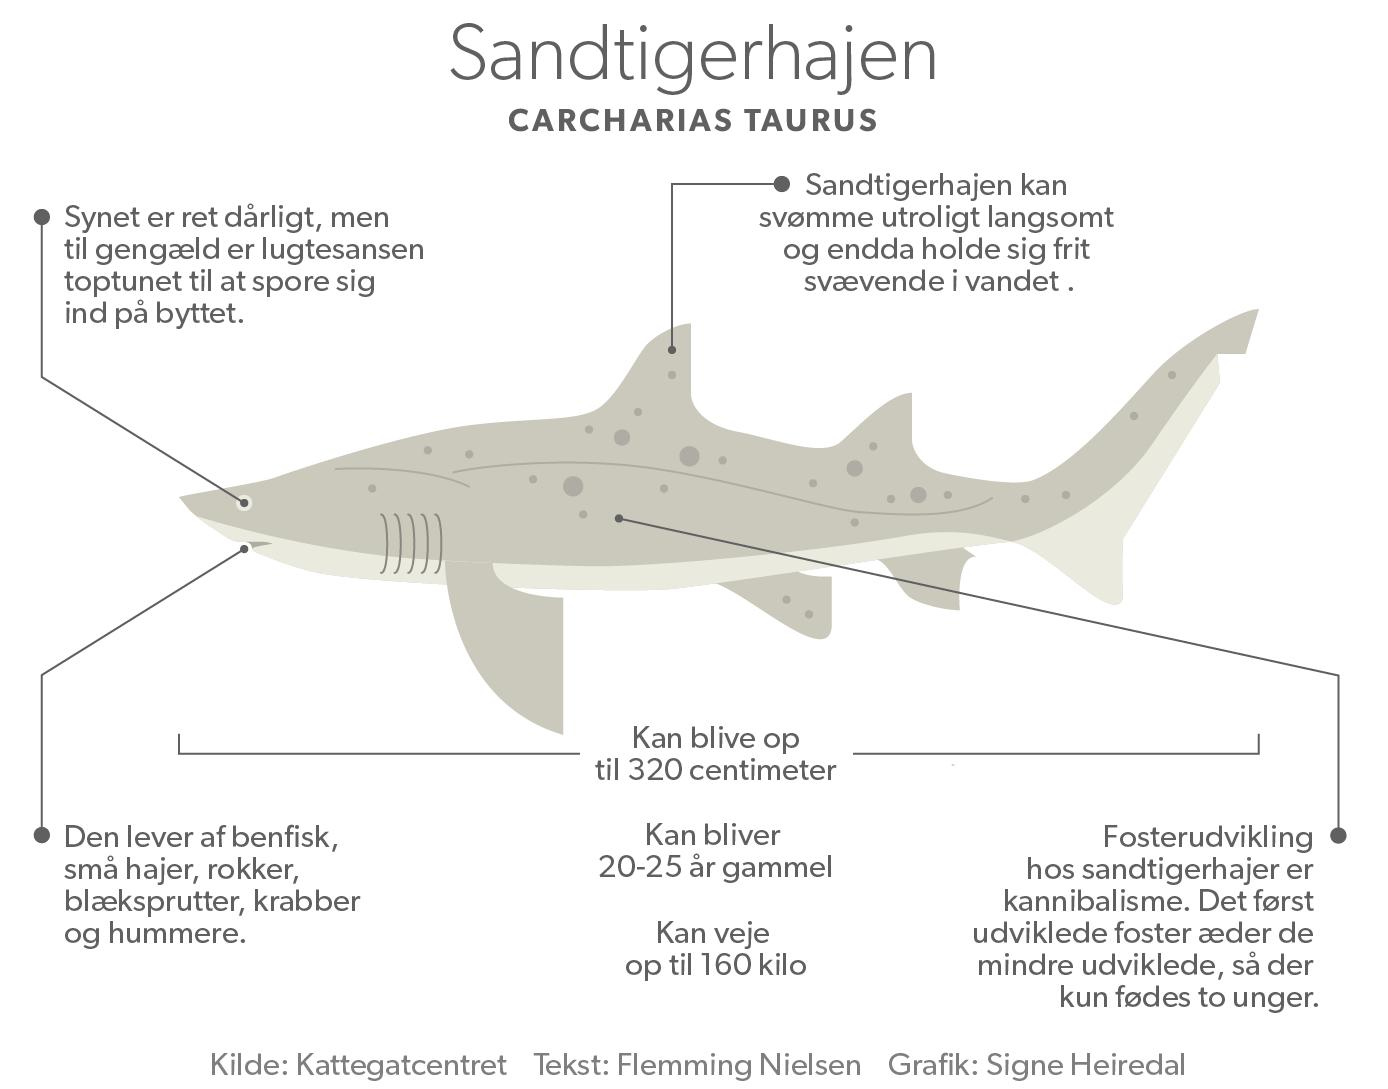 sandtigerhajen_694.png